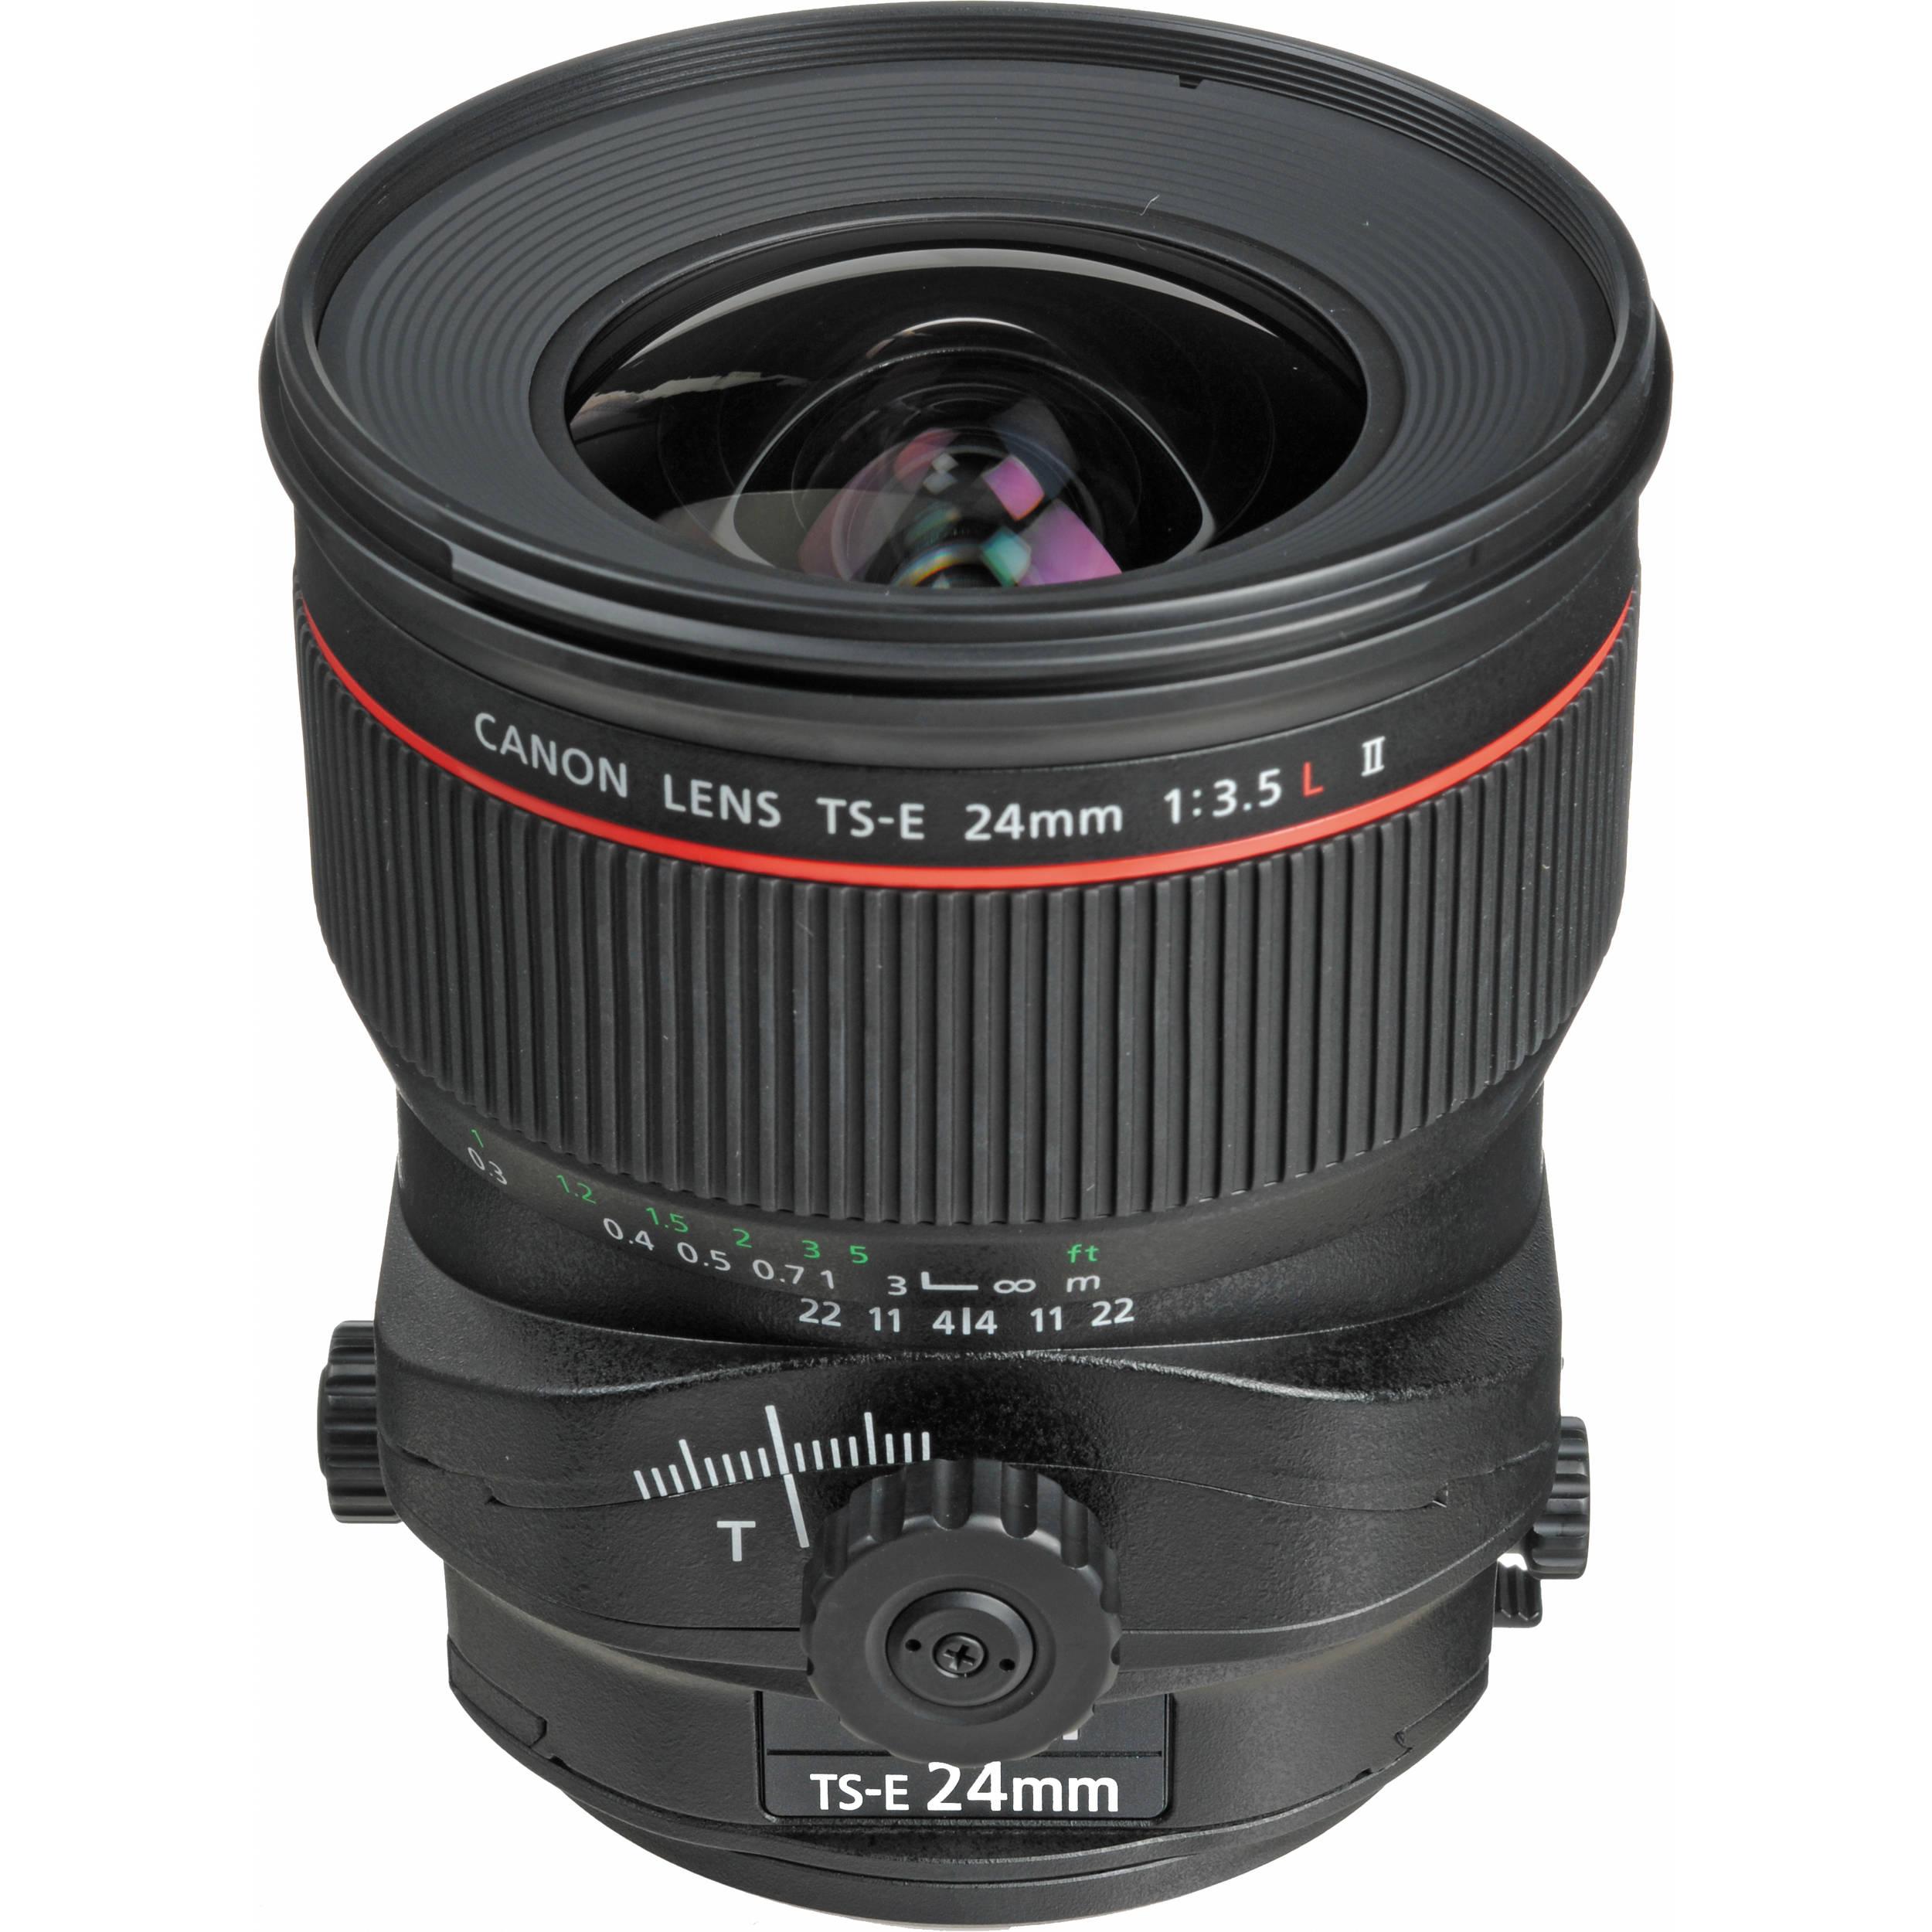 Canon TS-E 24mm f/3.5L II Tilt Shift Lens